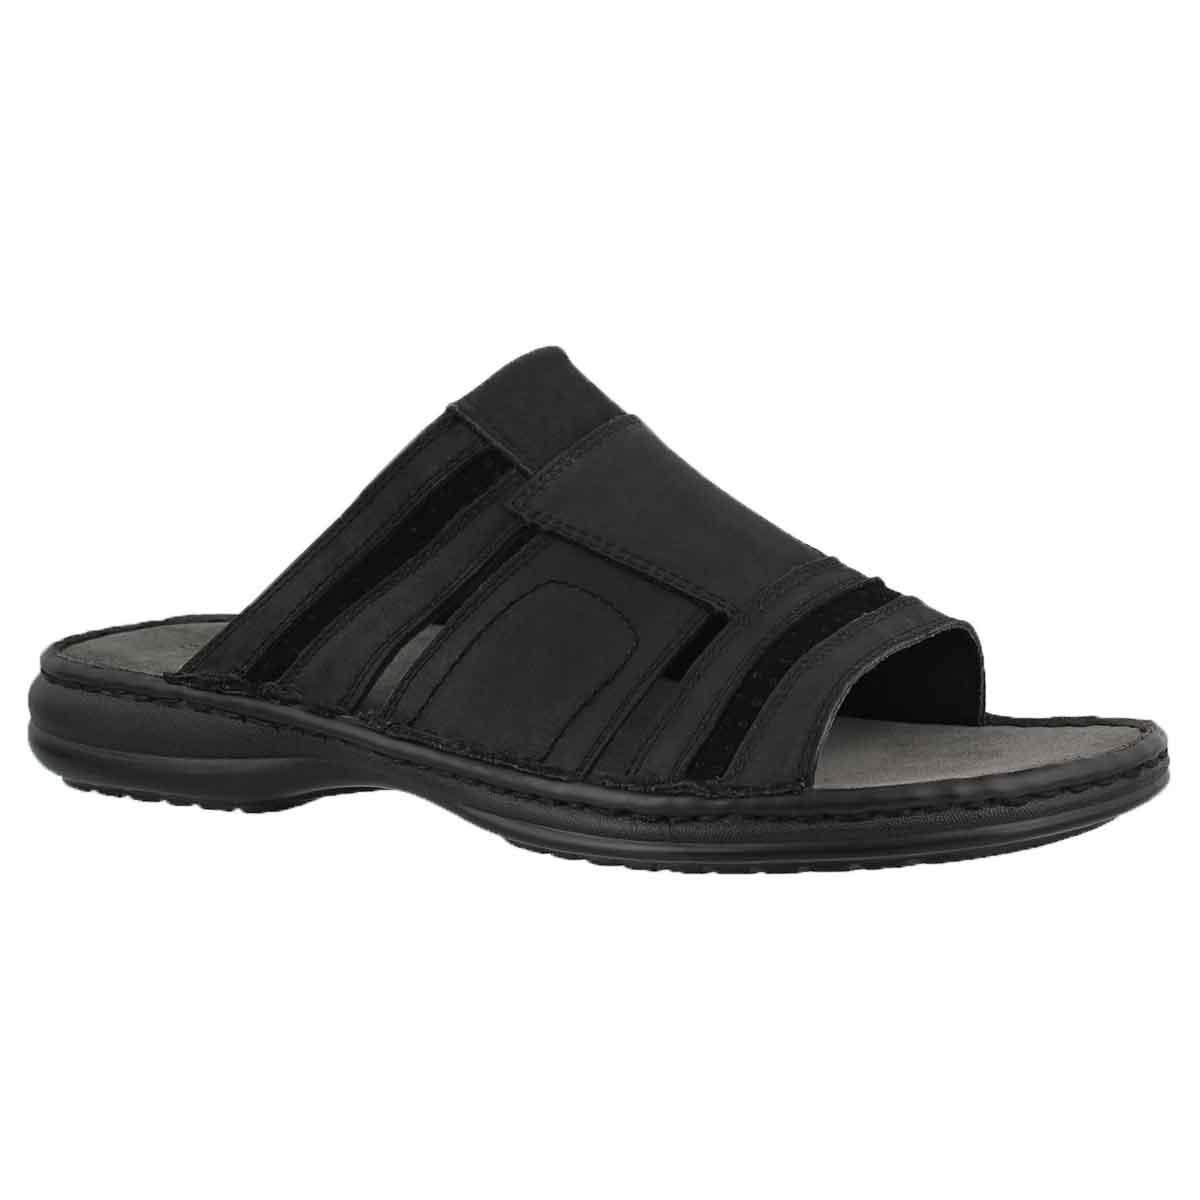 Mns Khal black casual slide sandal